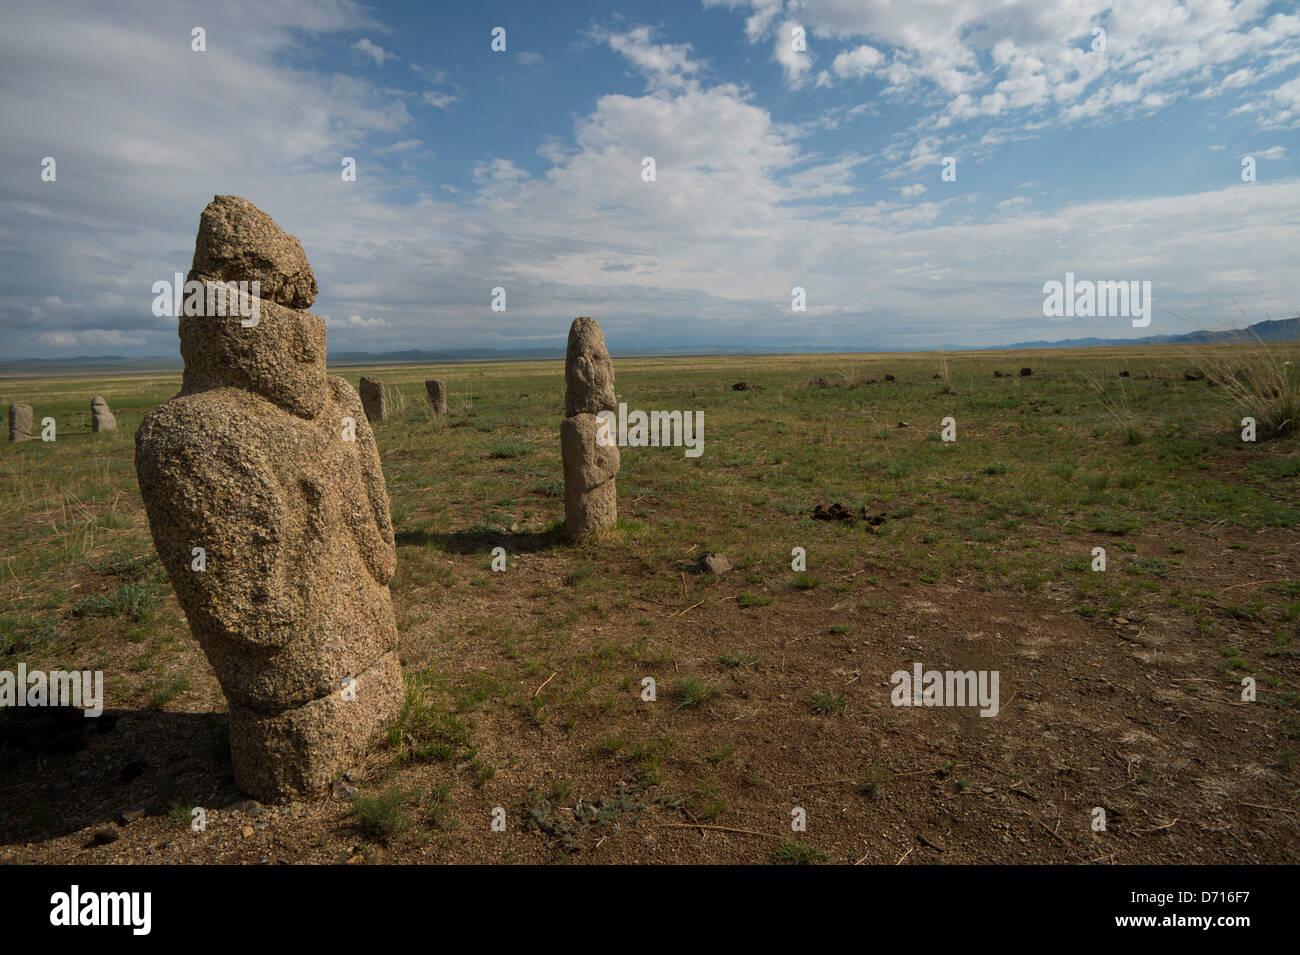 ongot-grave-neolithic-grave-in-tuul-rive